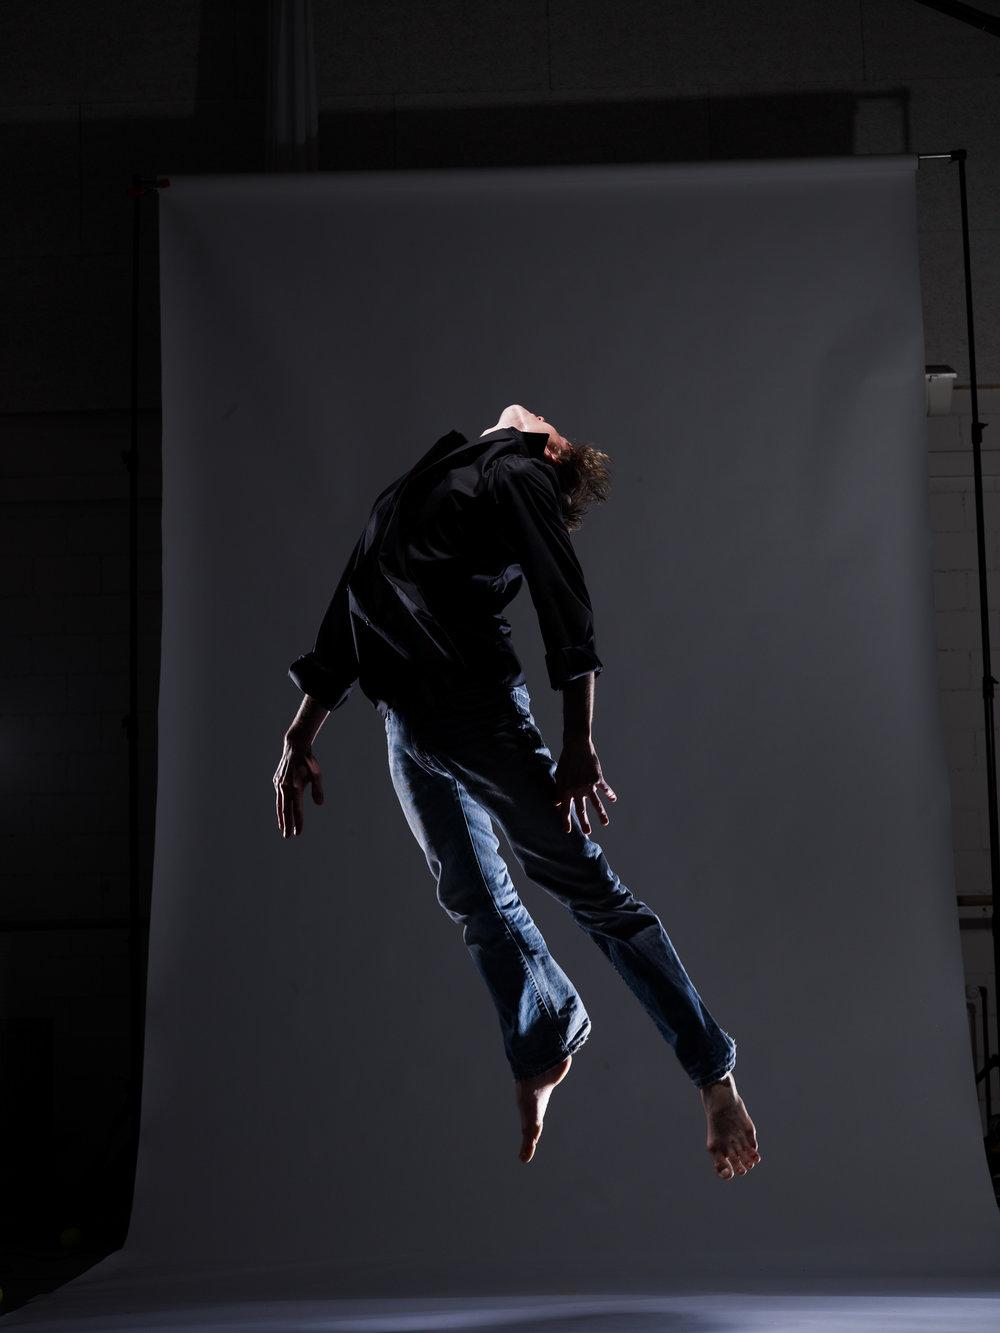 Bern_Ballet08_2-006135.jpg